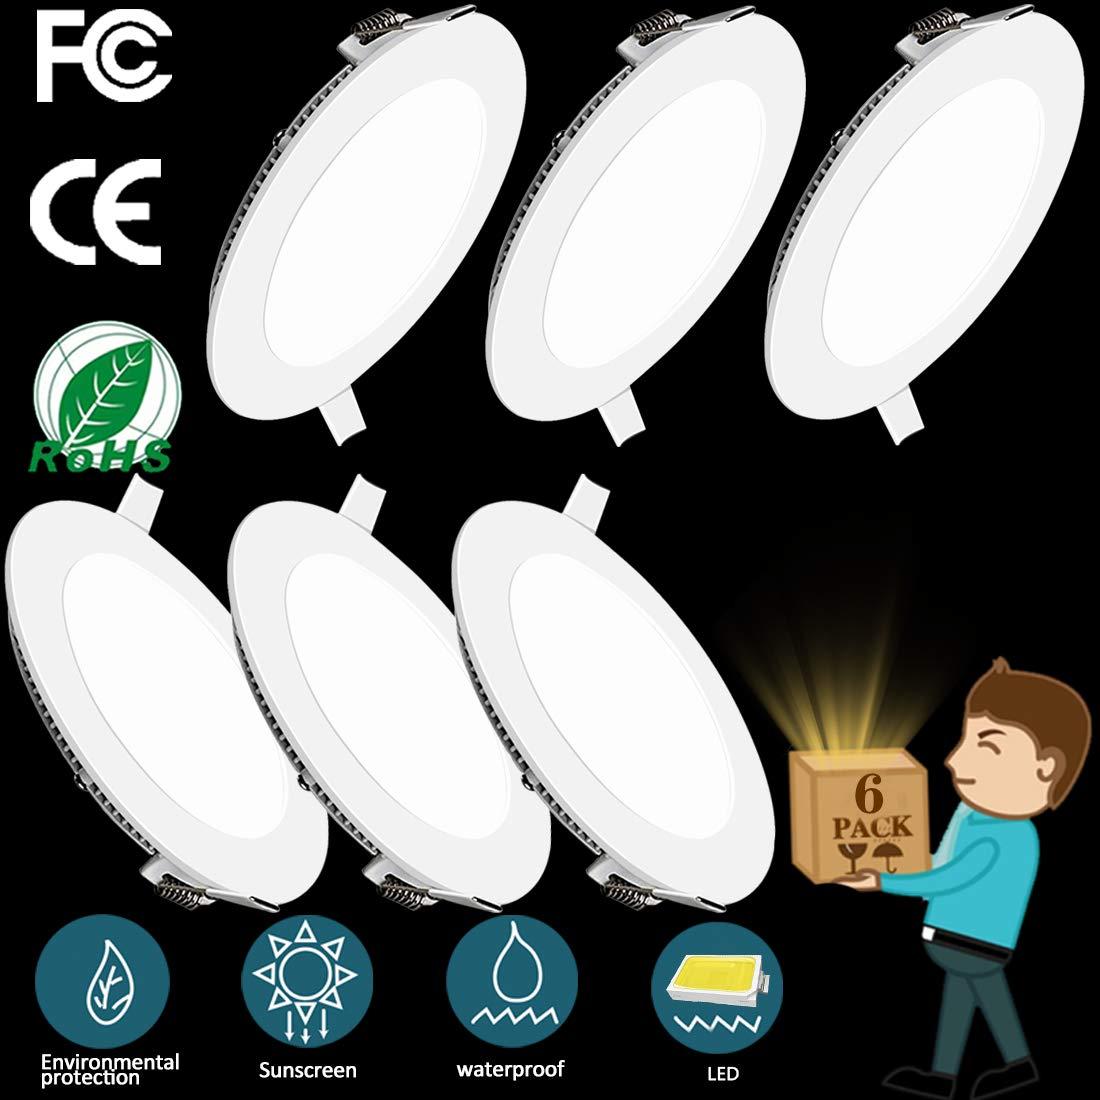 2 Pack LED Panel Light 15W 6500K Recessed Light Panel Round Ultra Slim Flat Panel Light Indoor Lighting for Home Living Room Bedroom Bathroom Office Corridor Hallways